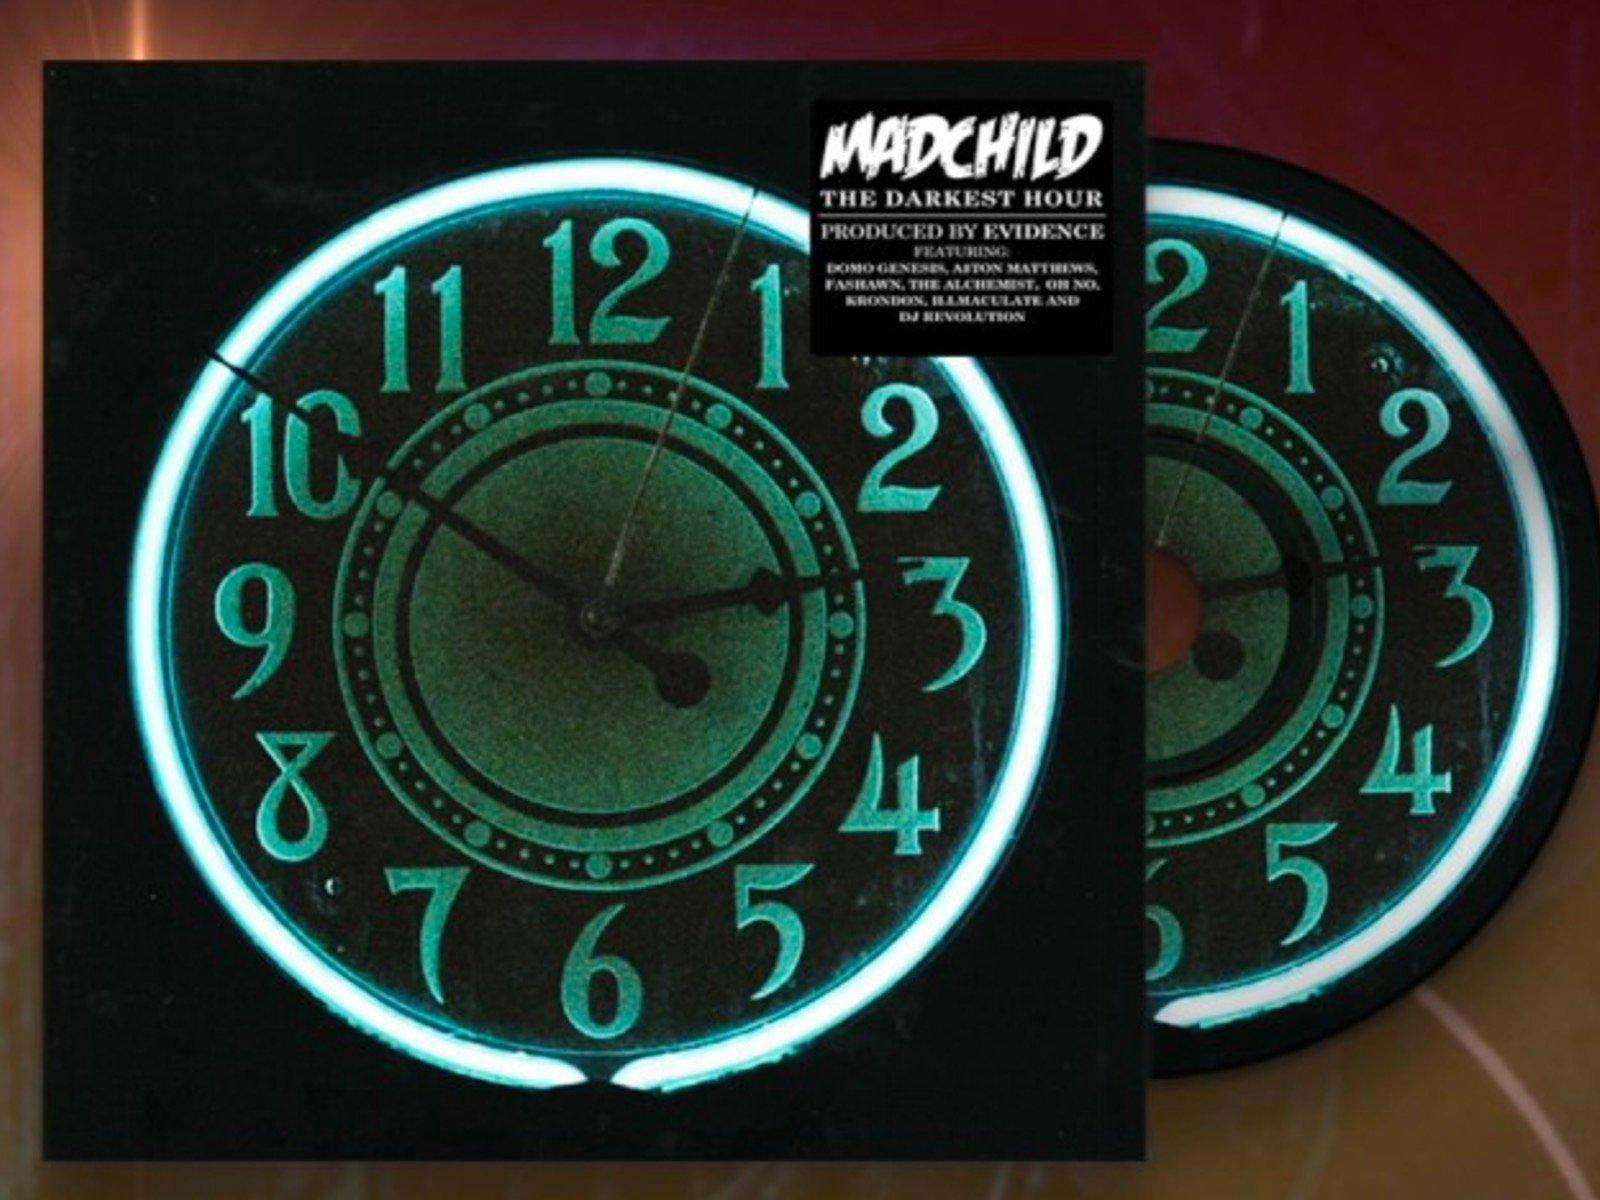 Madchild The Darkest Hour